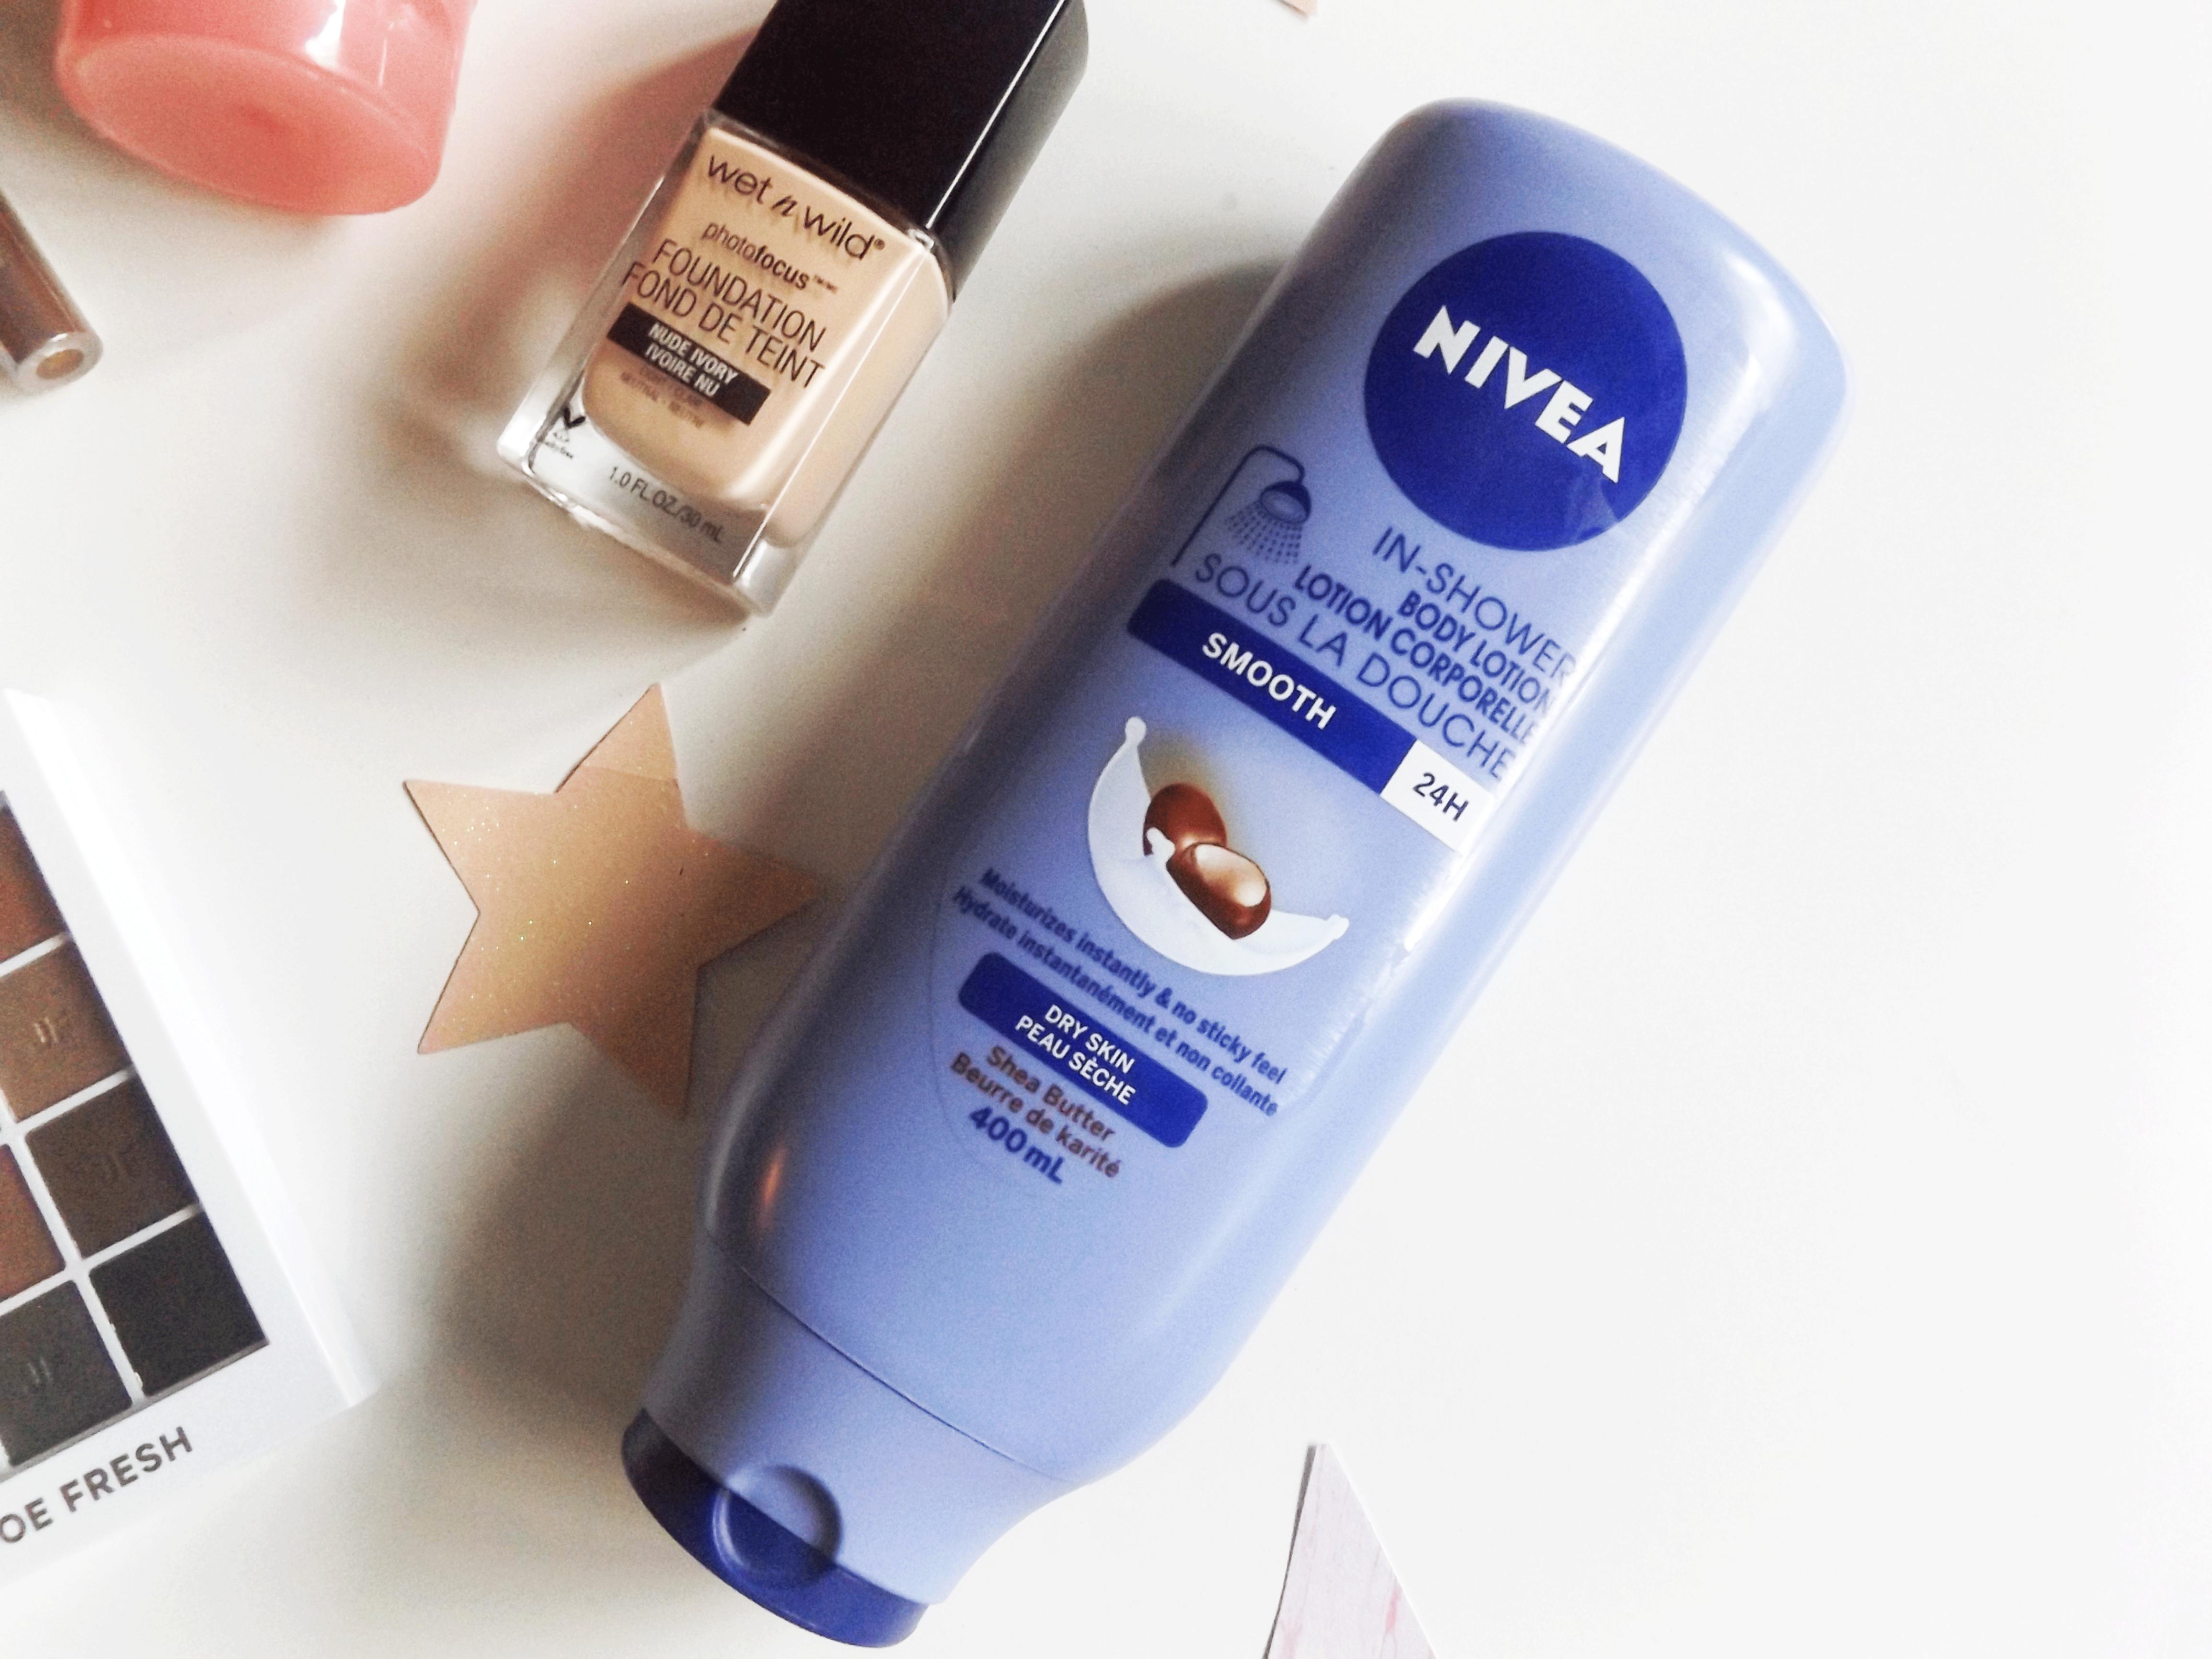 Nivea in shower body lotion